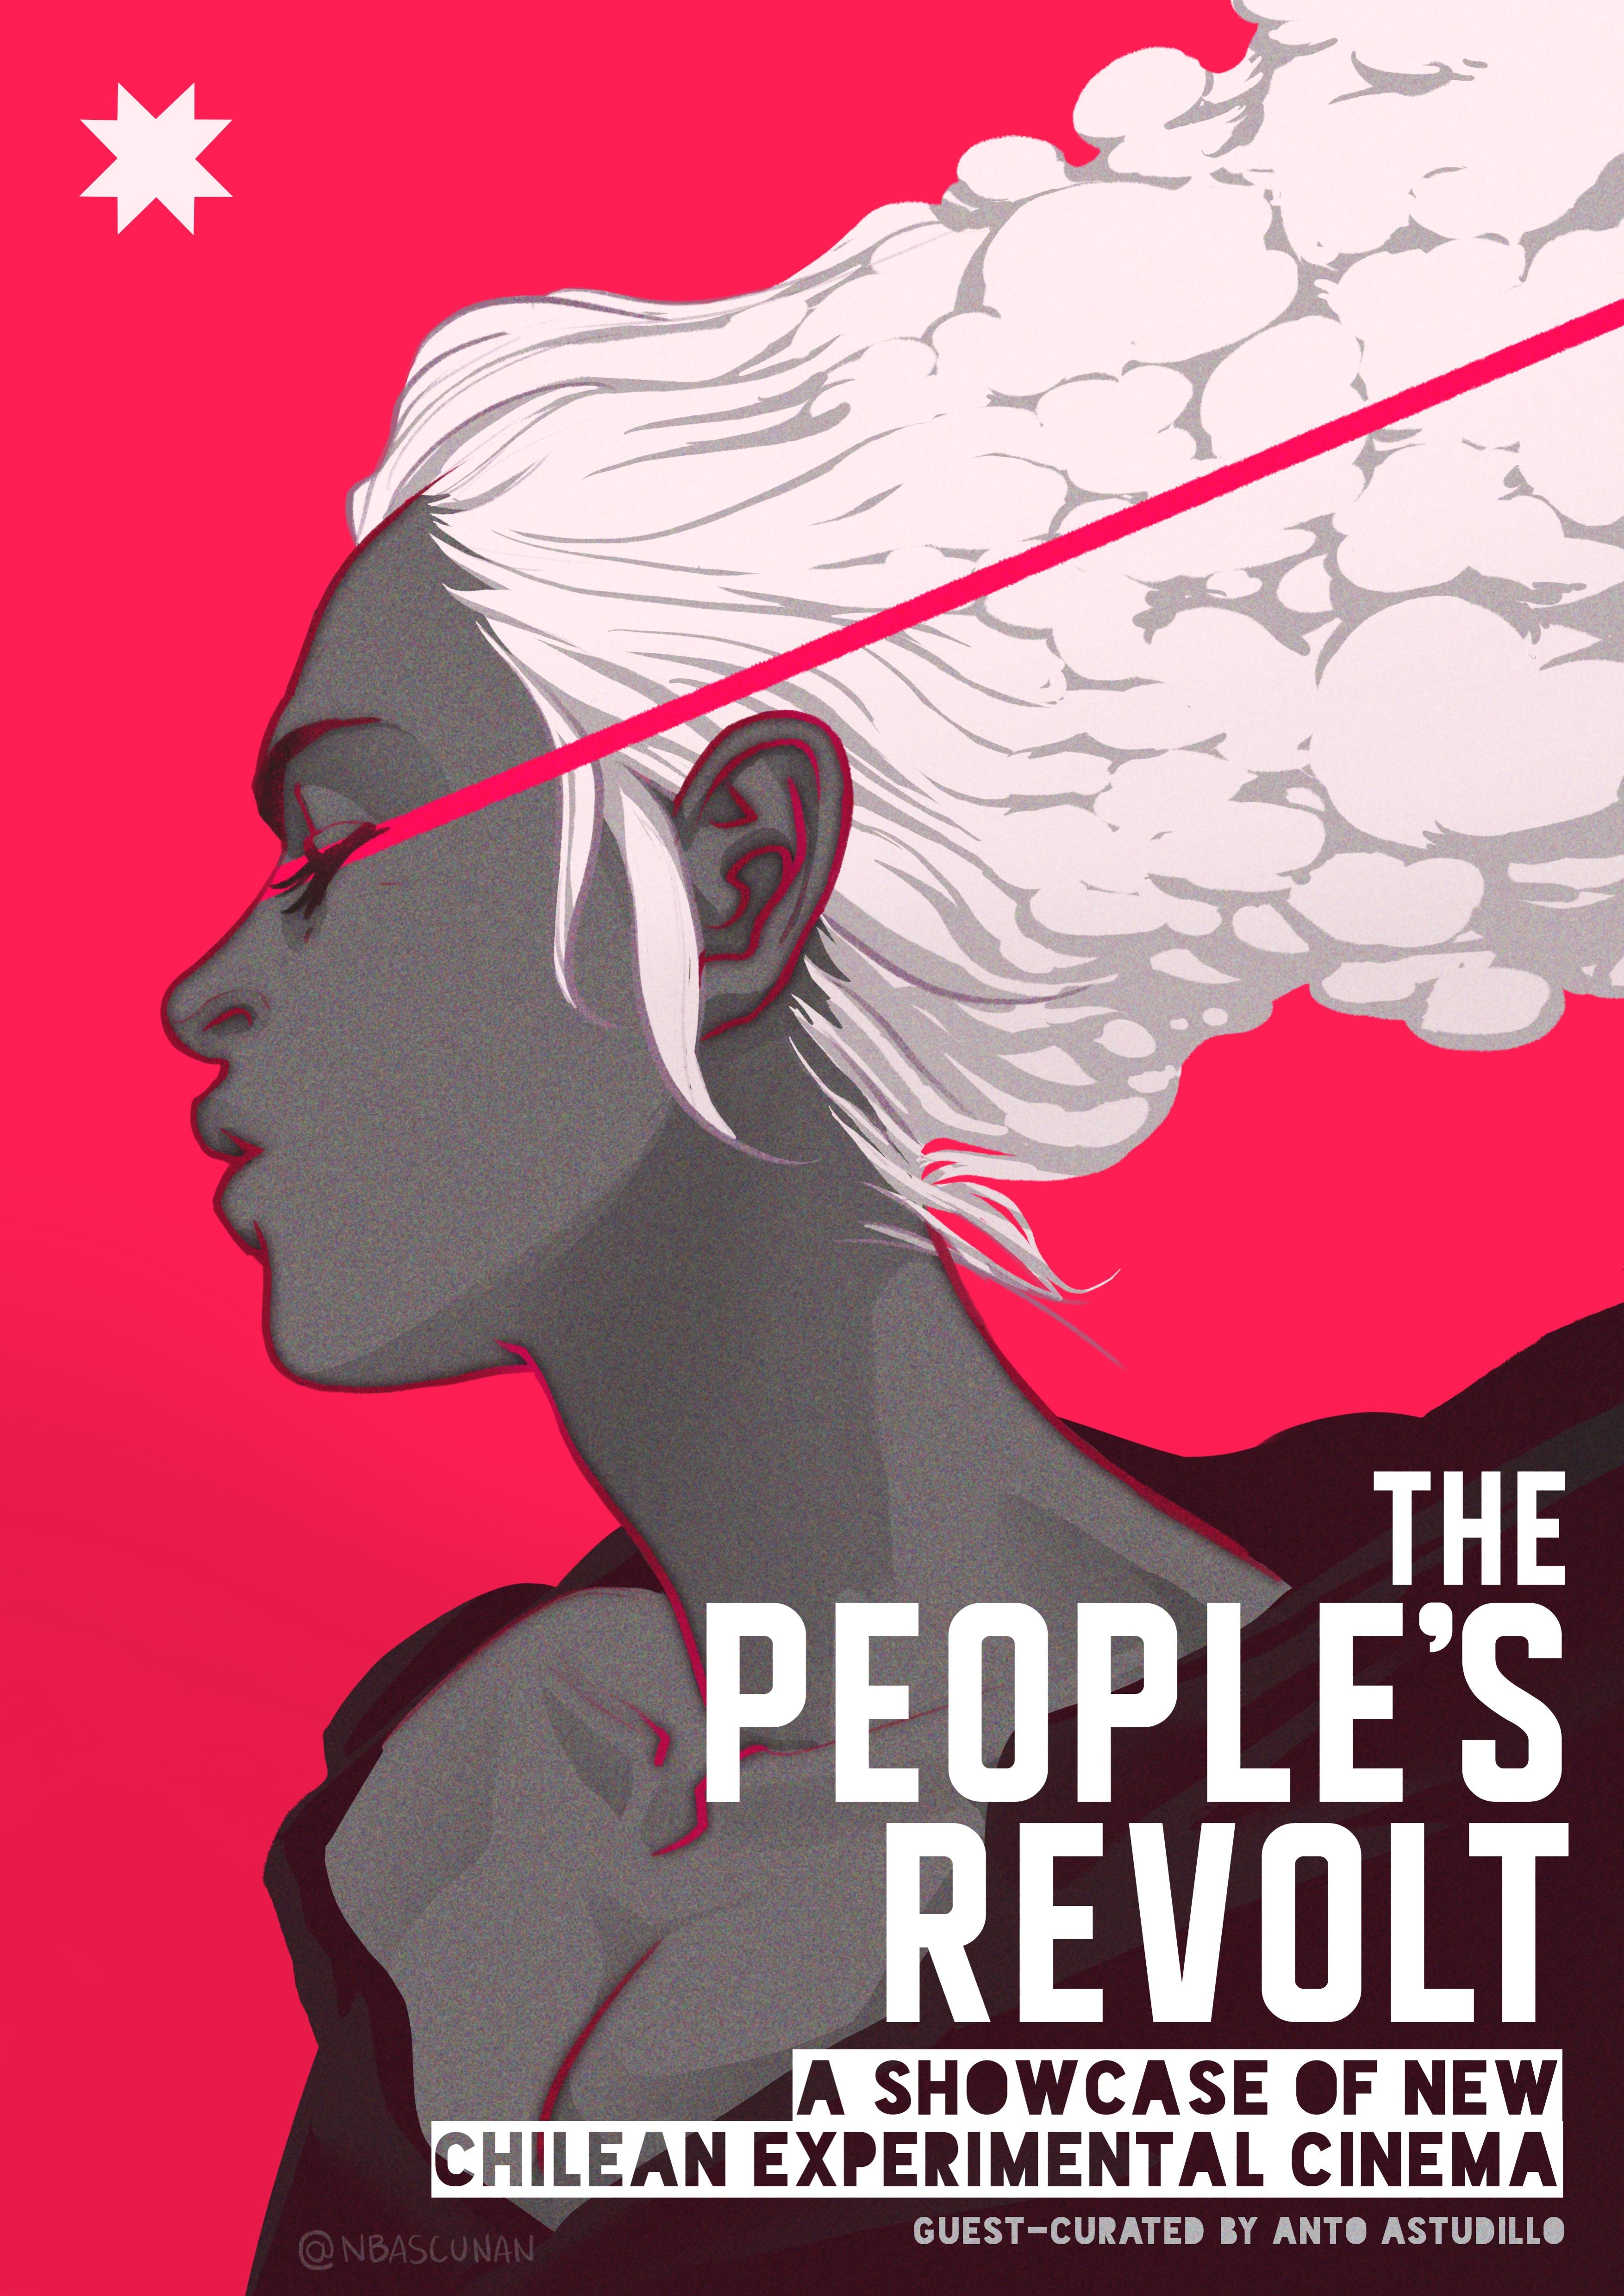 The_People's_Revolt-en-wd copy.jpg